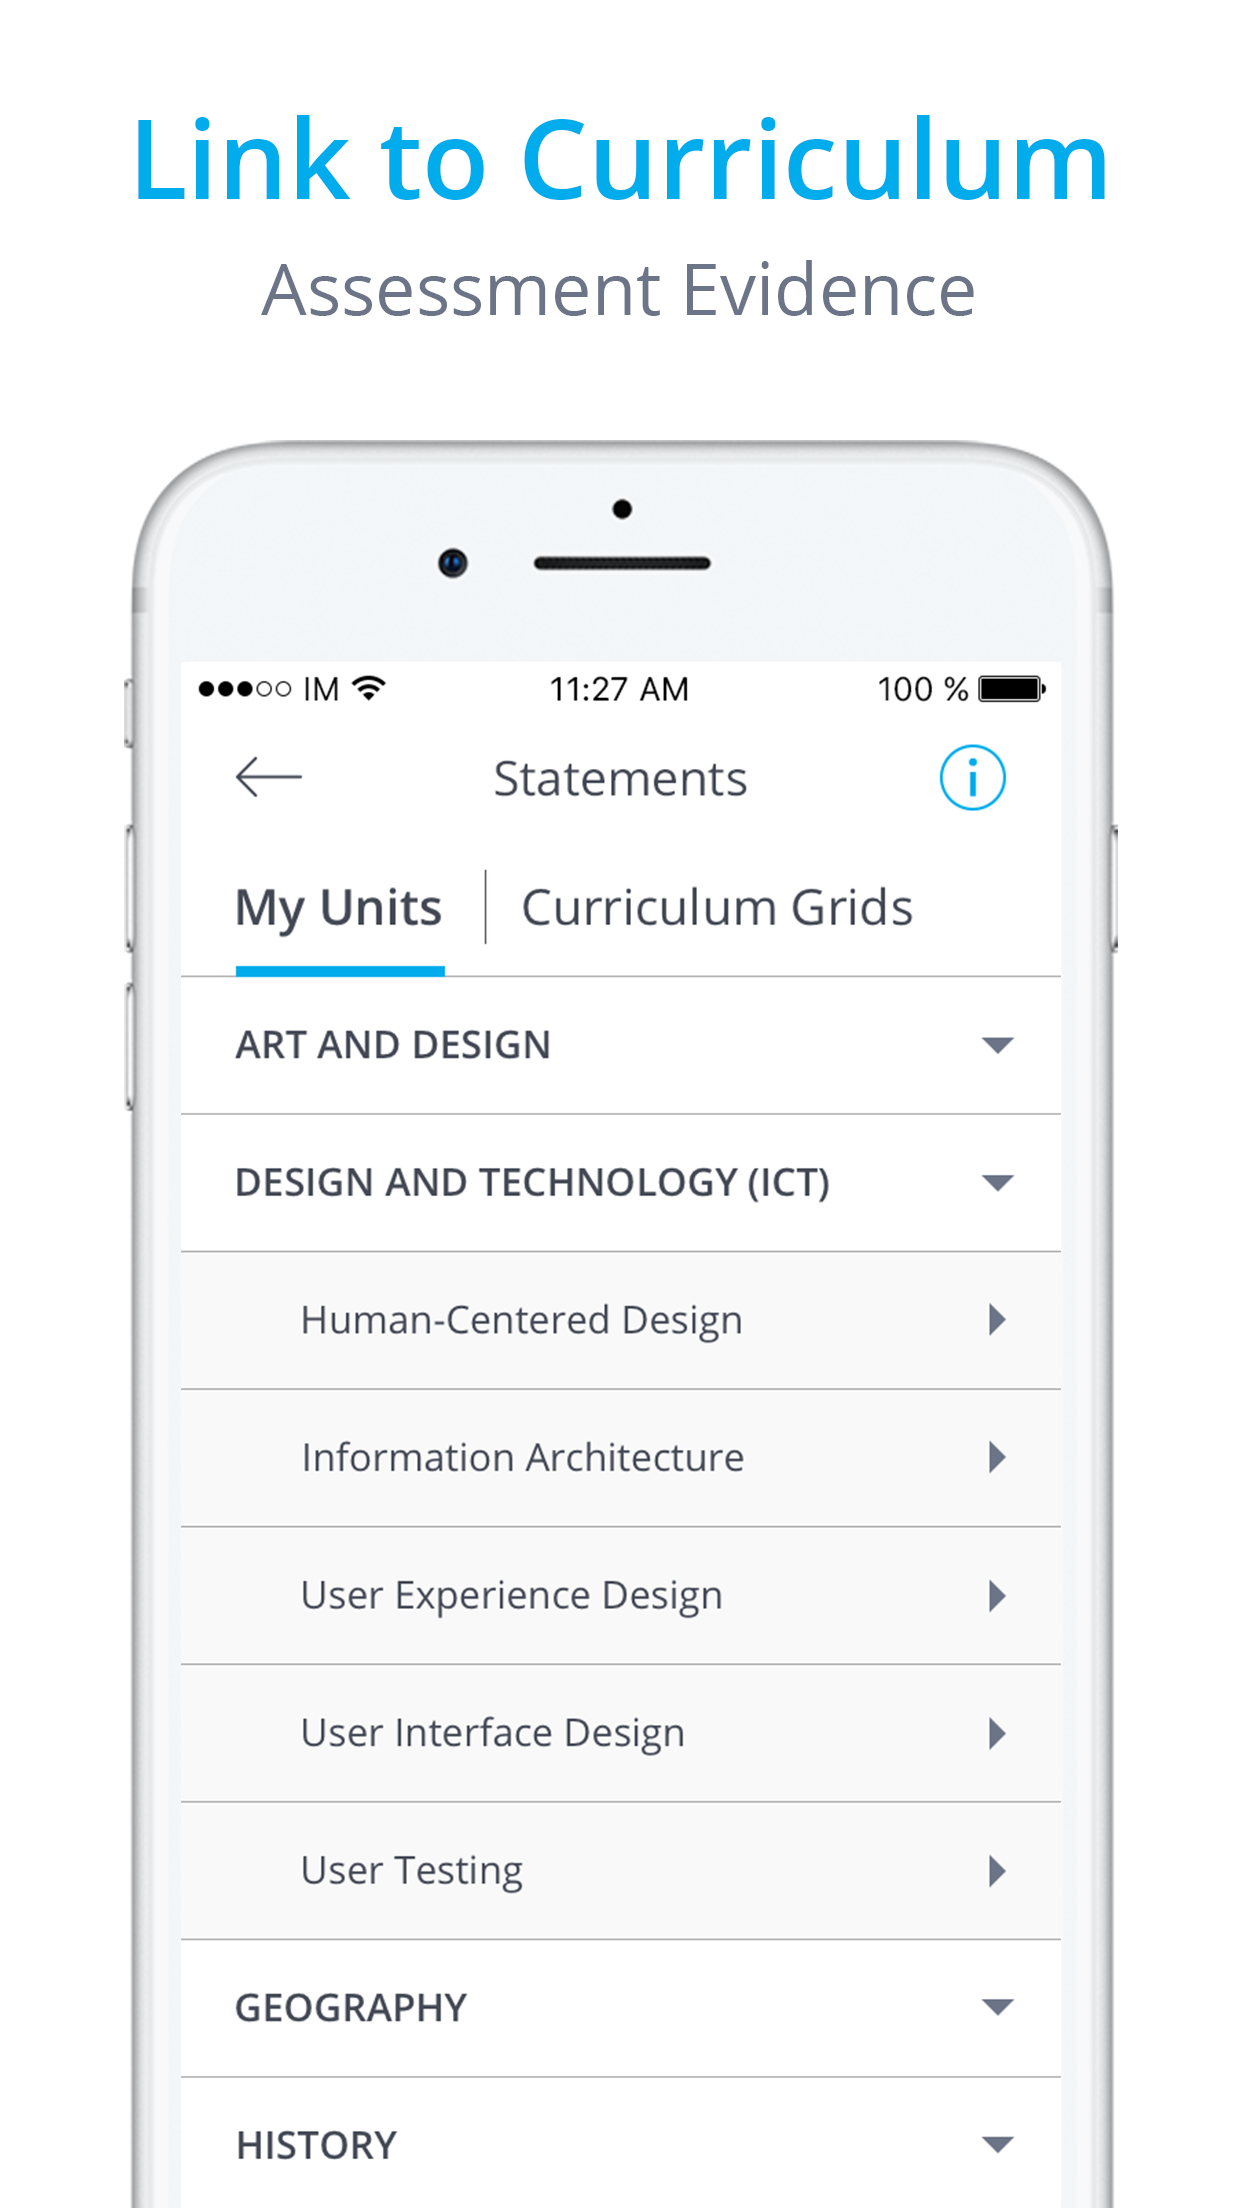 InfoMentor Media App - iPhone Screenshot 4.png